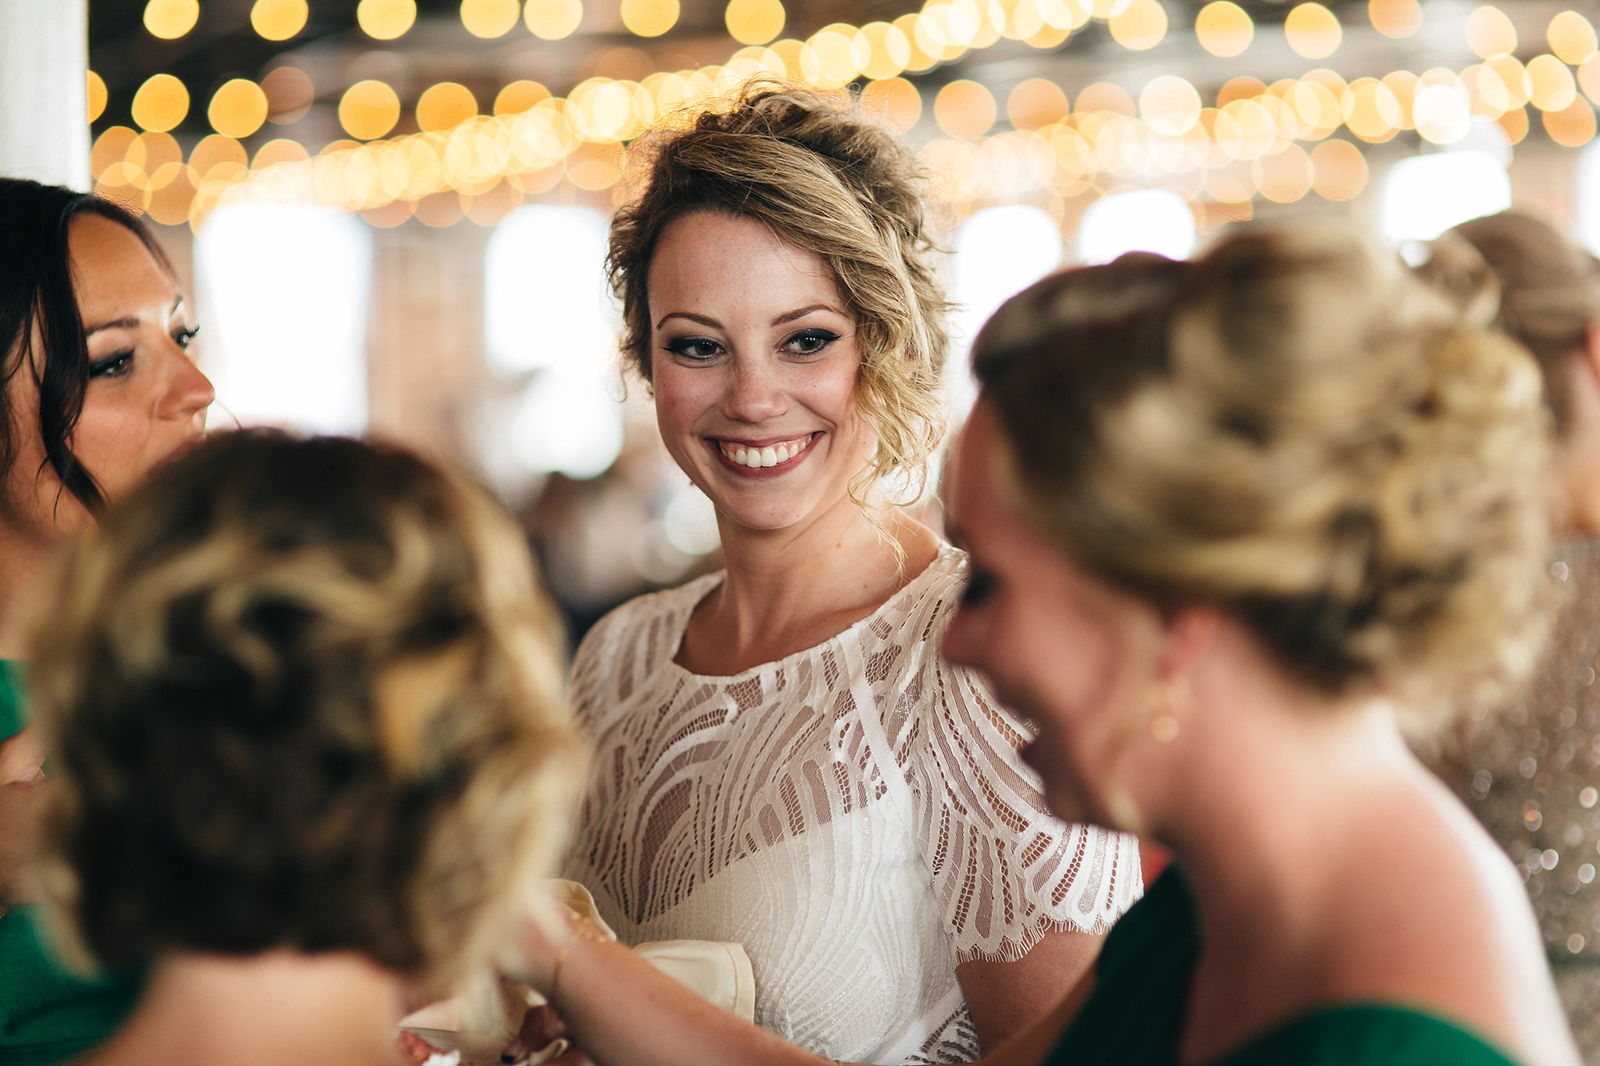 Bride talks to guests at her wedding reception in Toledo, Ohio.